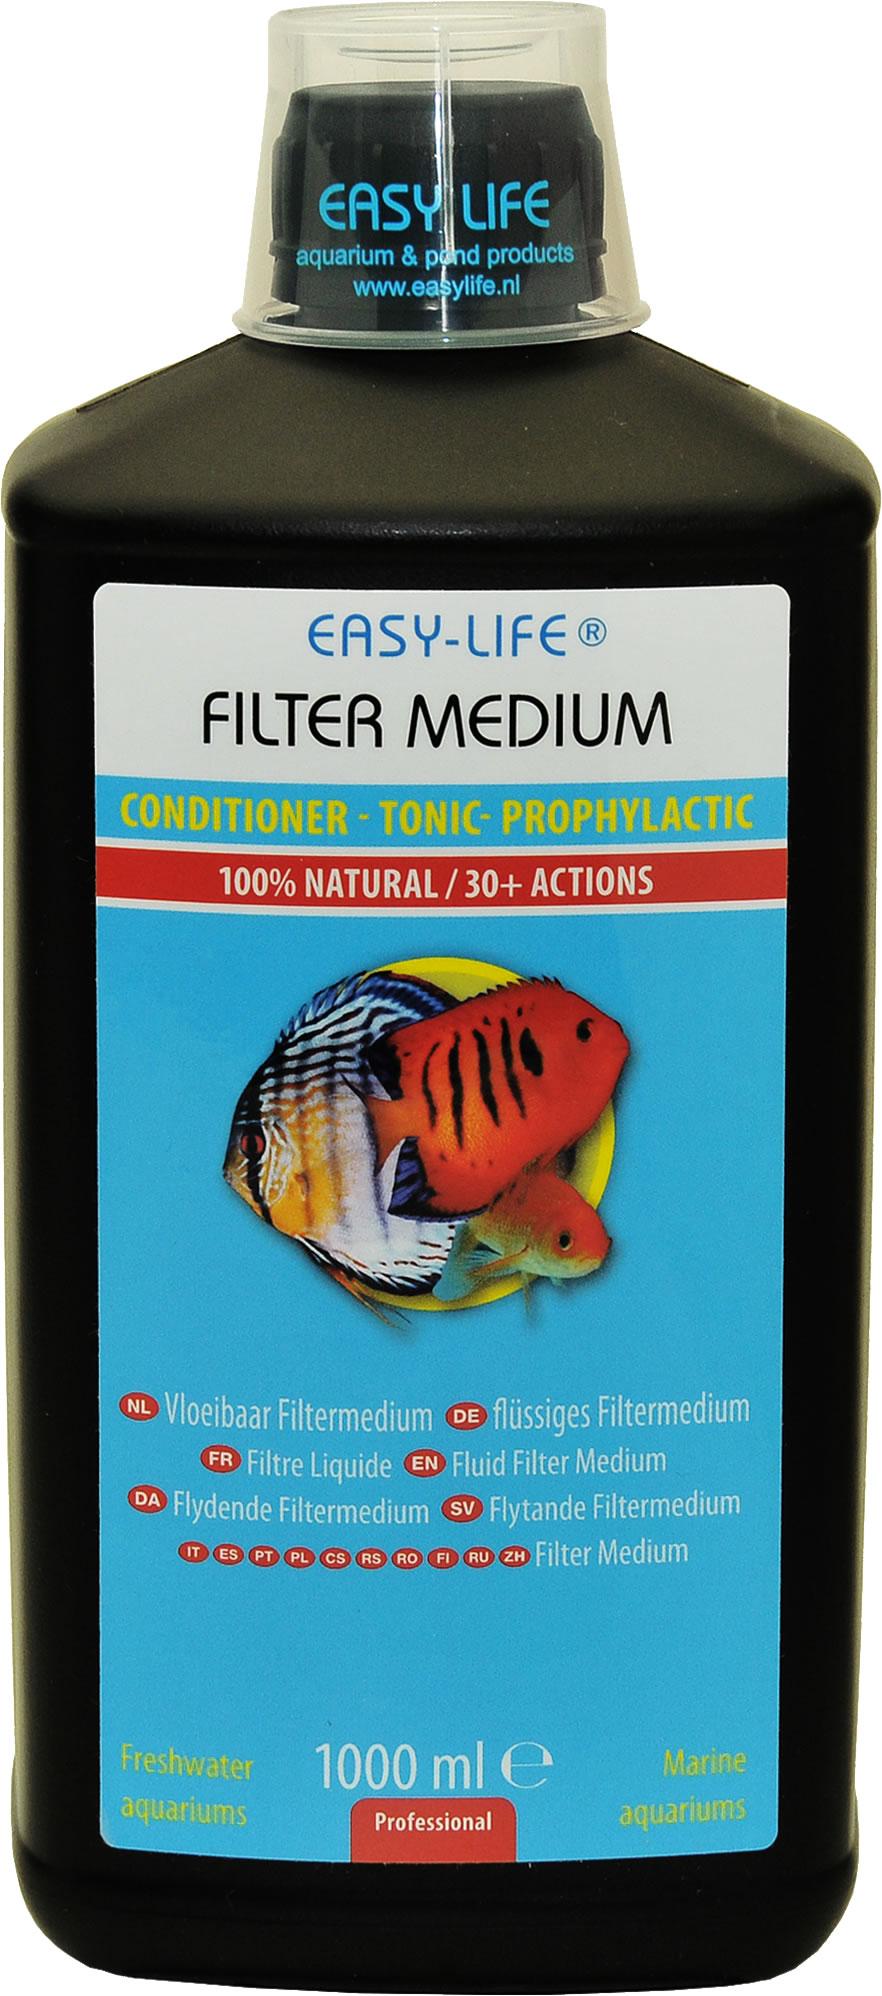 Easy Life FFM Filter Medium 1.000 ml - broschei